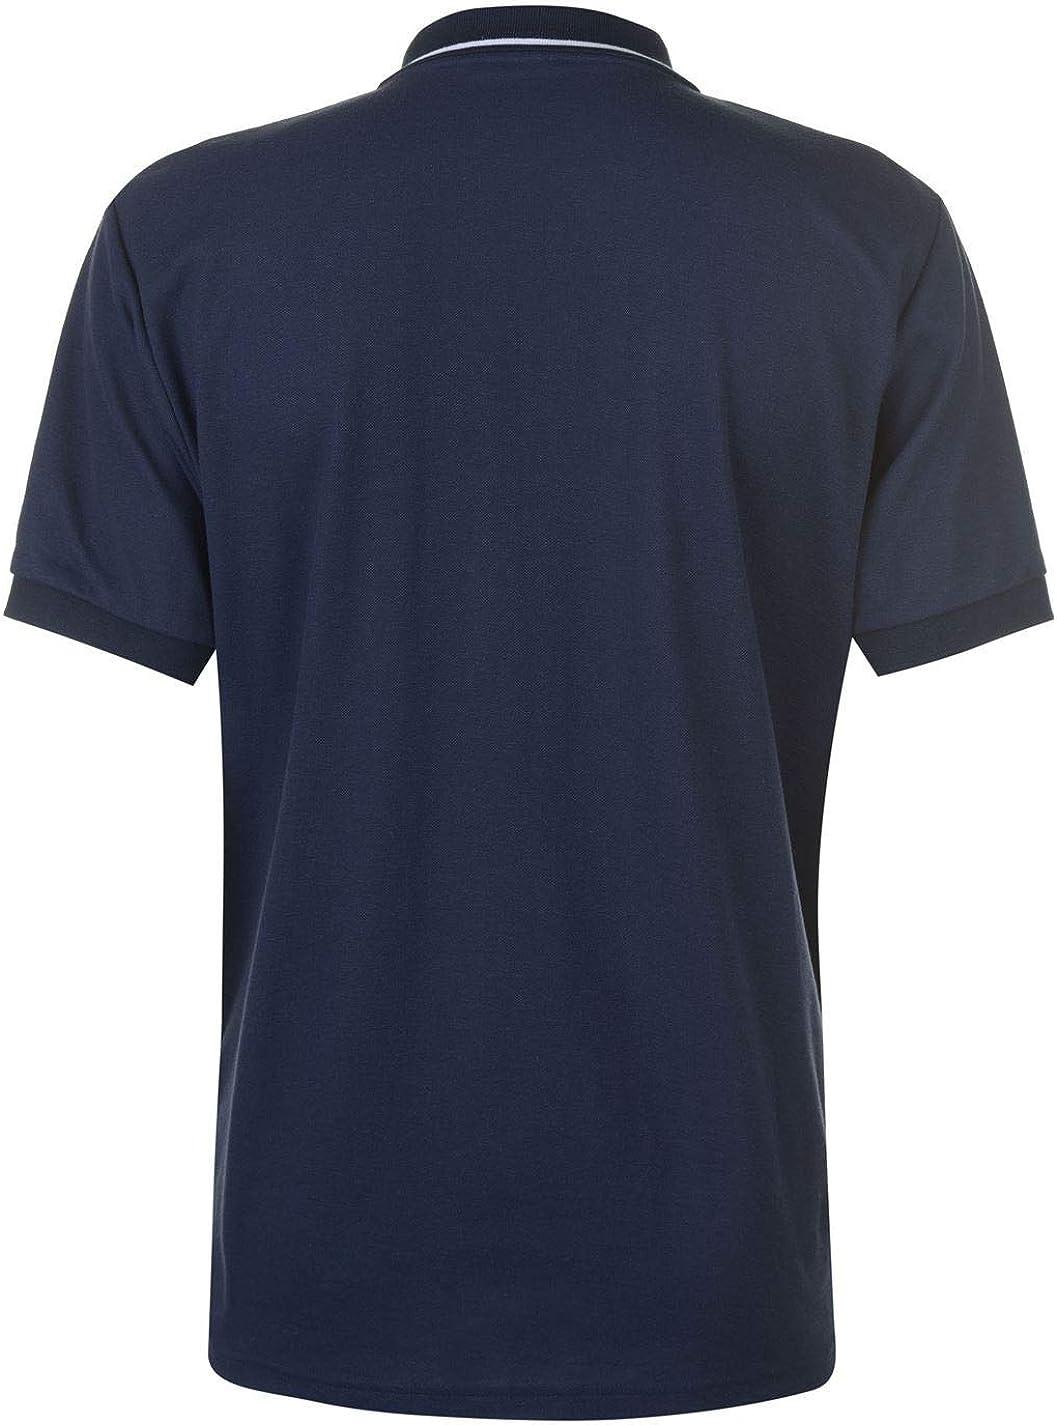 Tottenham Hotspur Crest Polo Shirt Mens Navy Football Soccer Fan Shirt Top Medium